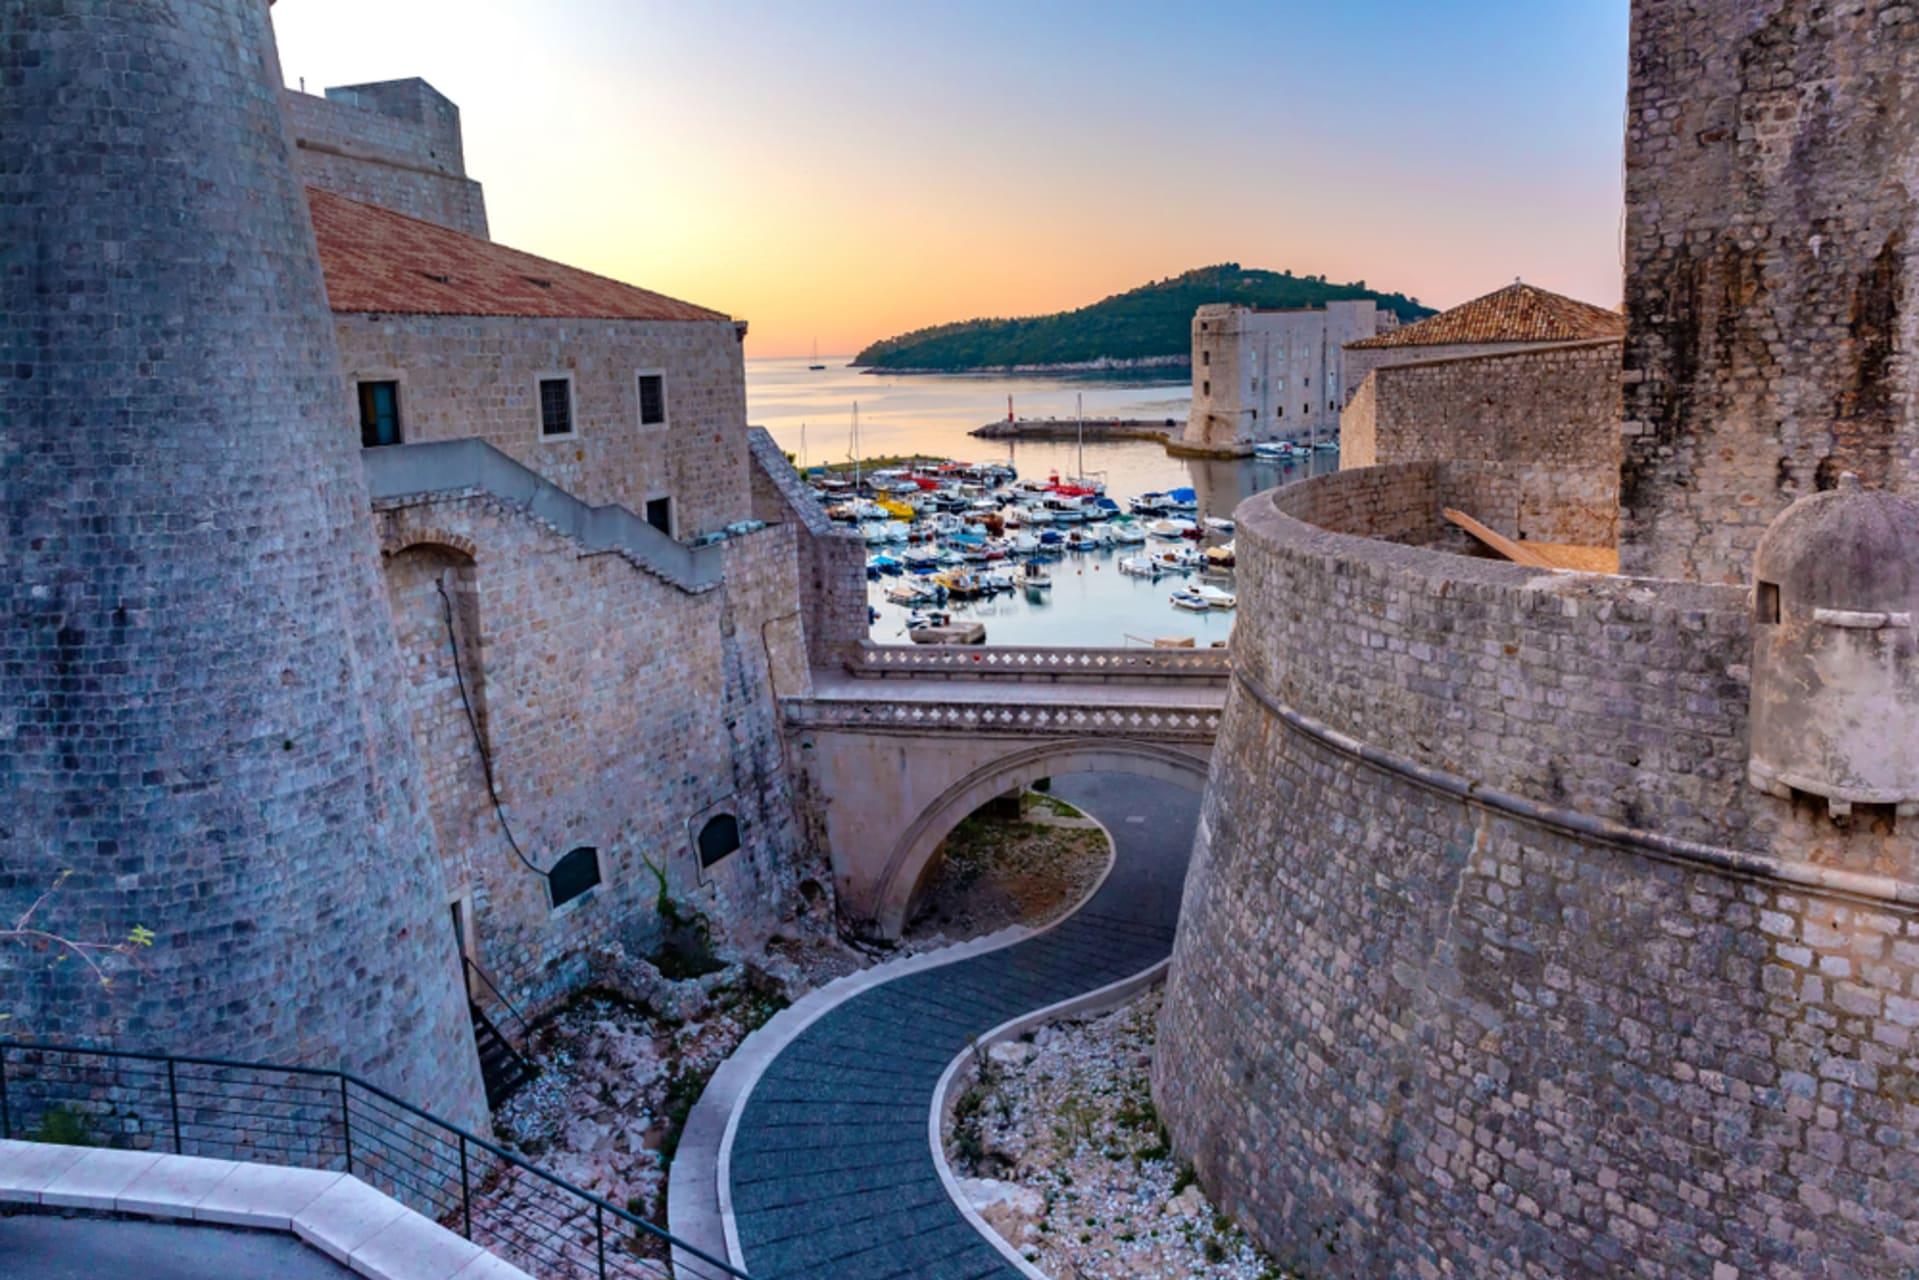 Dubrovnik - Dubrovnik Old Town Wall Walk